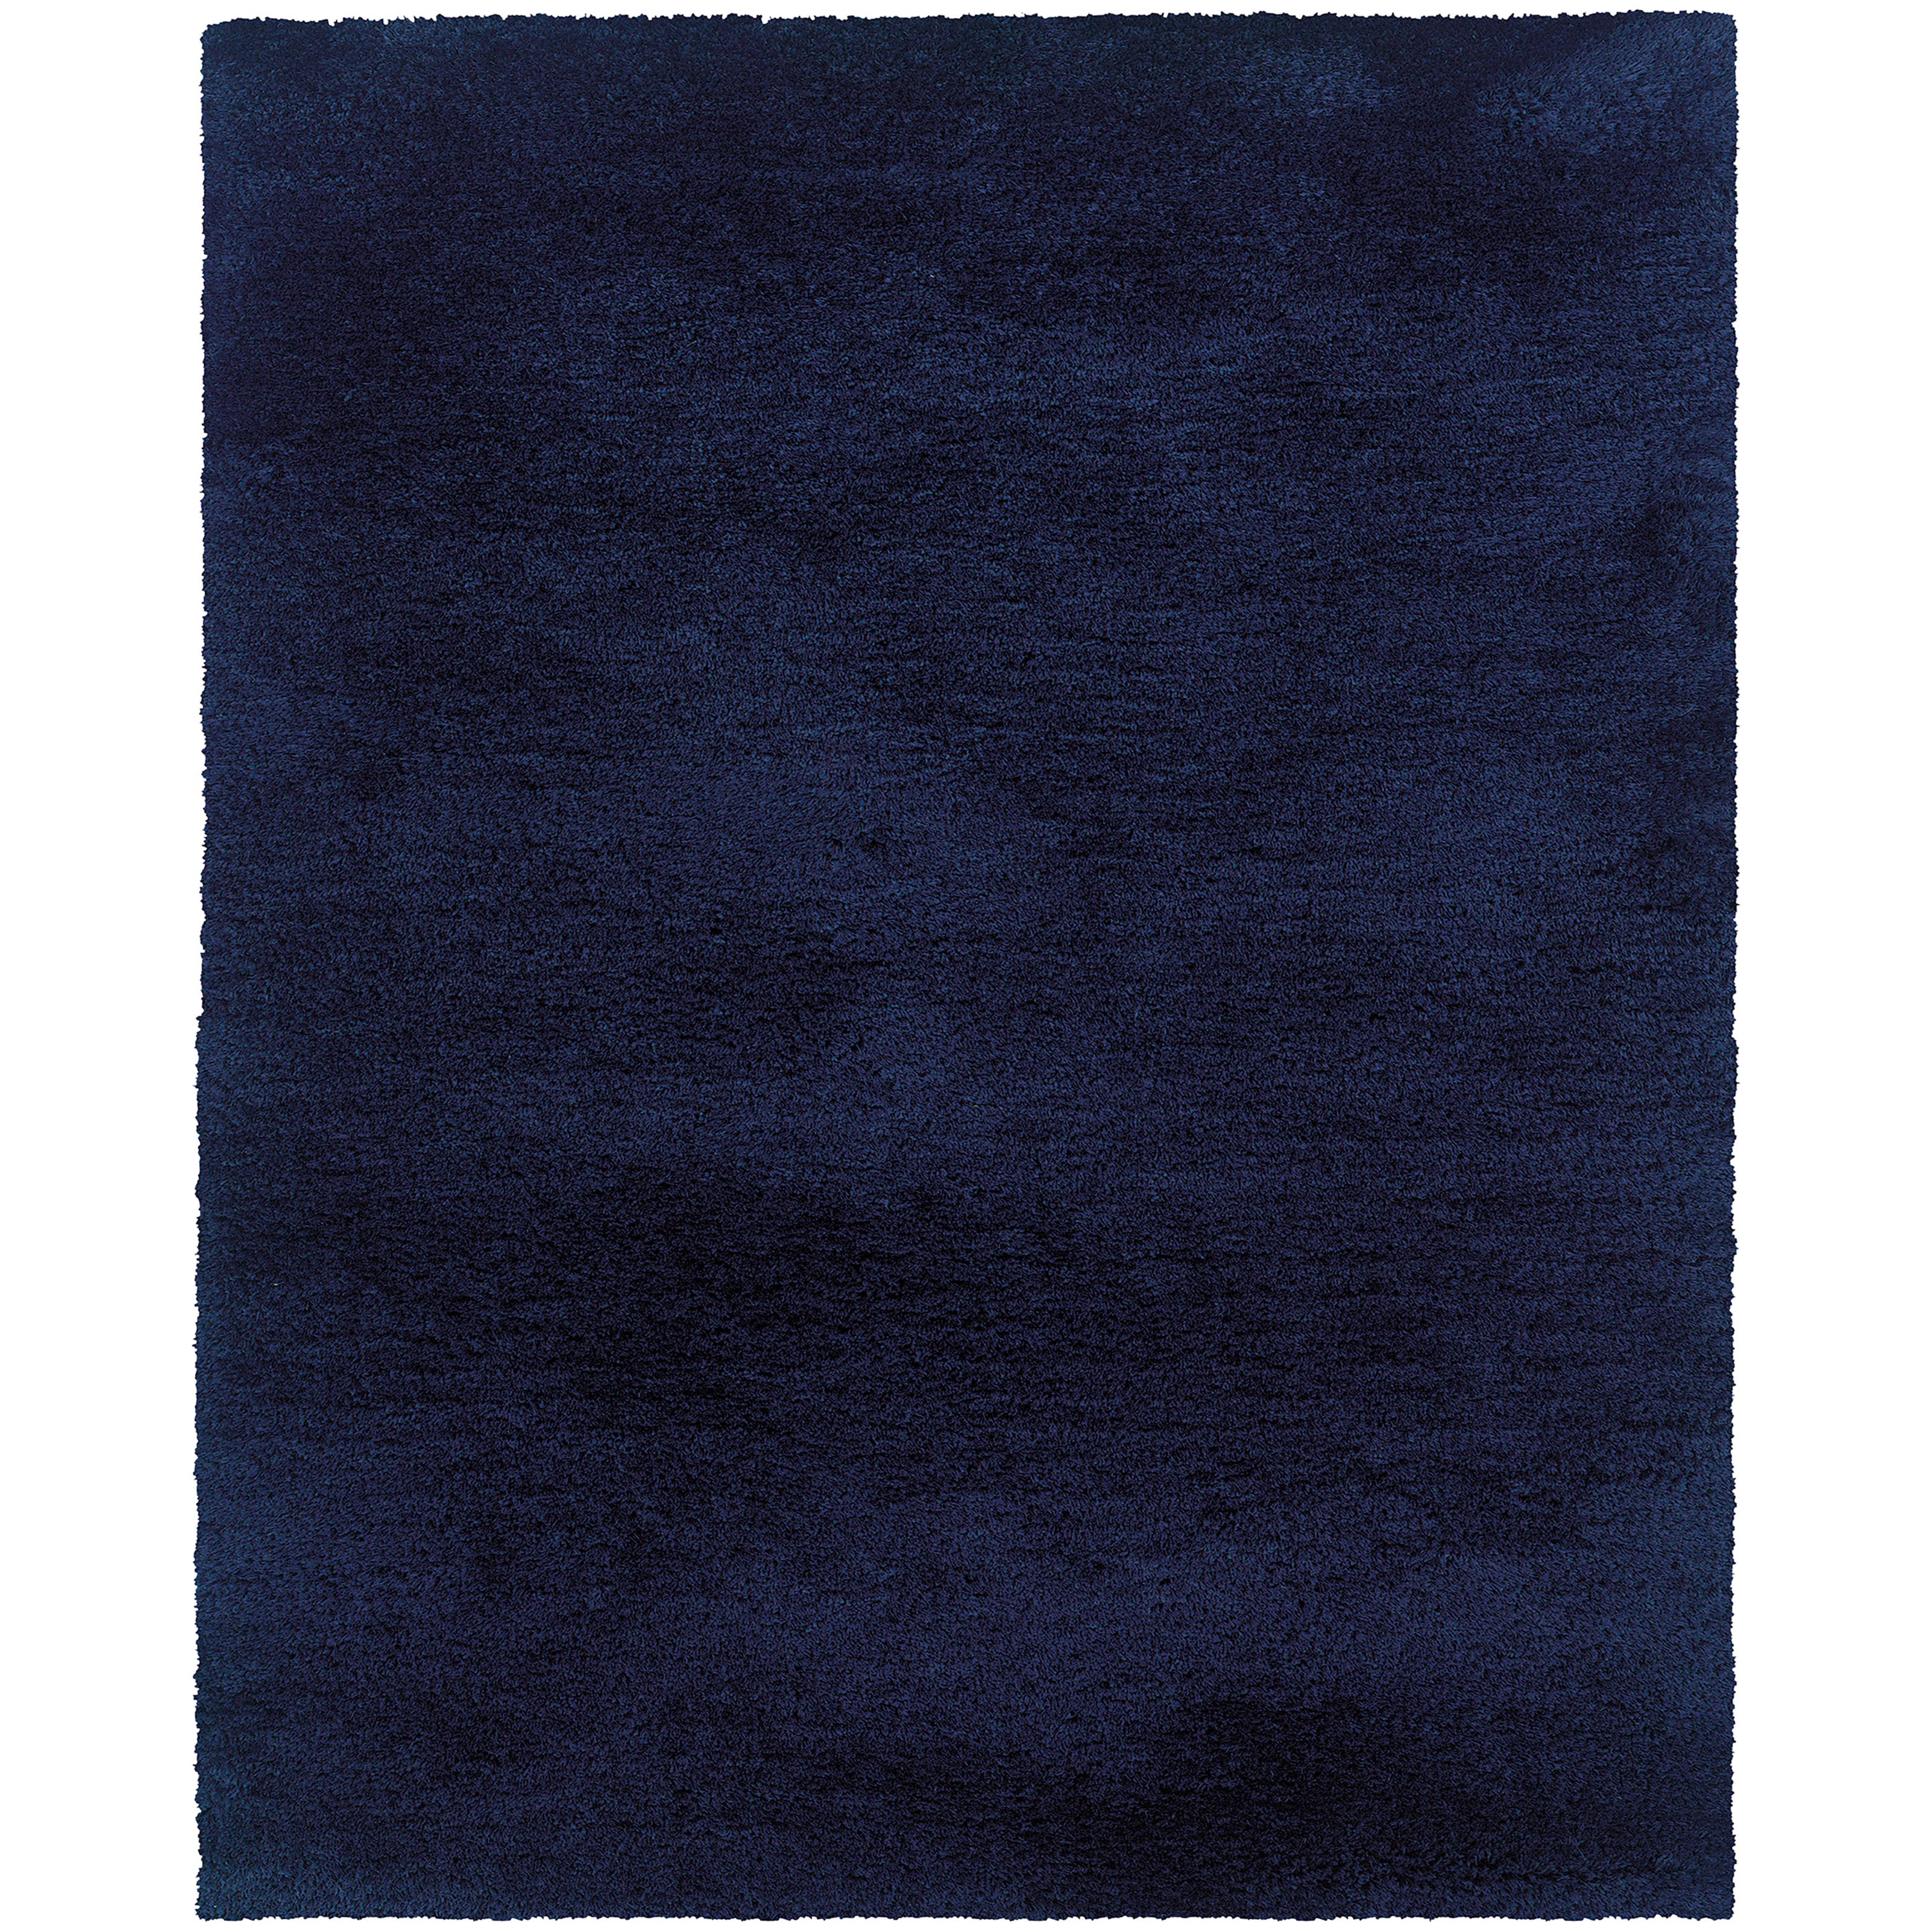 "Oriental Weavers Cosmo 6' 6"" X  9' 6"" Rug - Item Number: C81106198289ST"